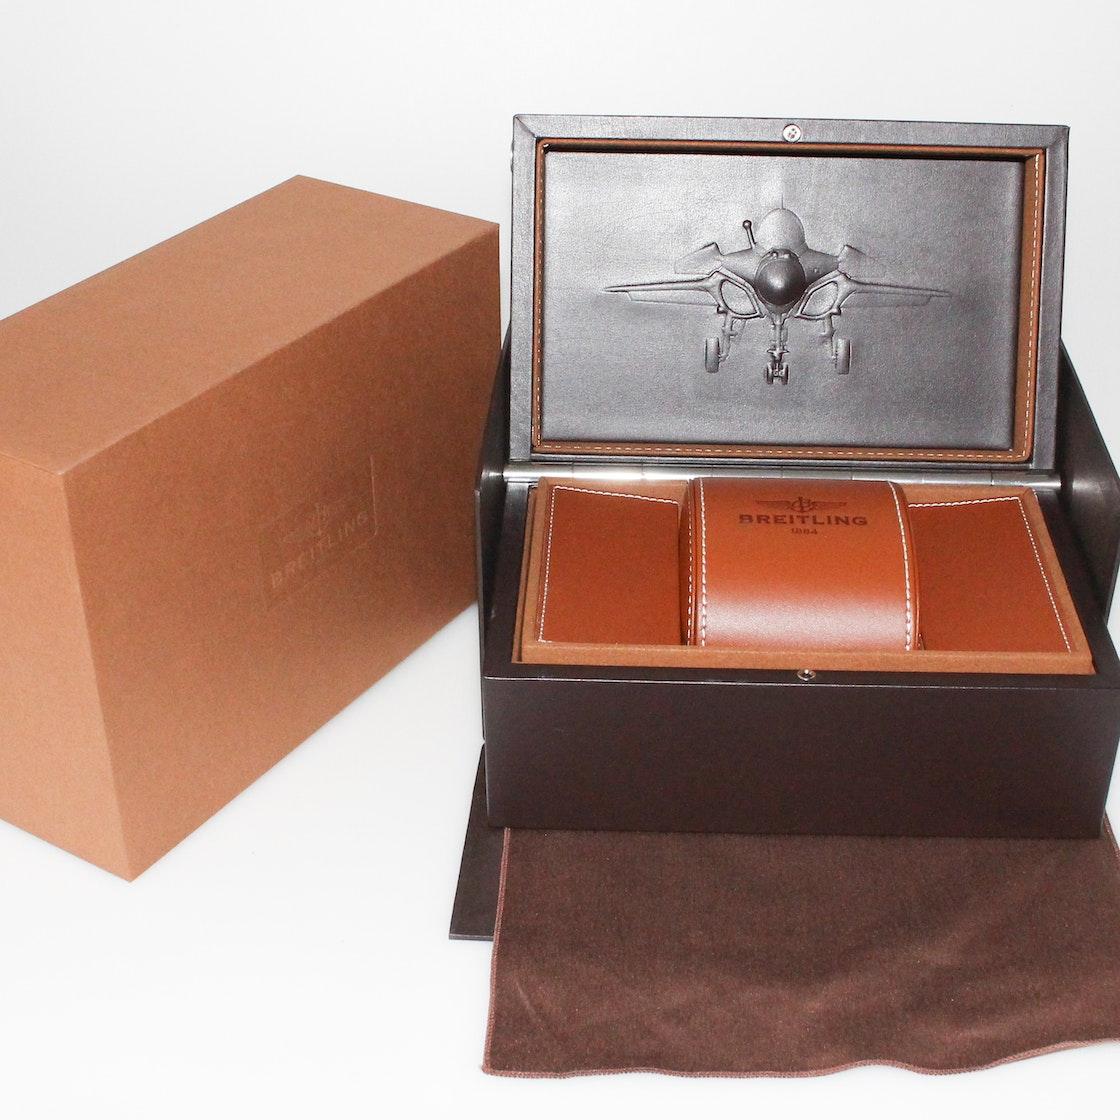 Breitling Transocean Chronograph Unitime RB0510U4/BB63